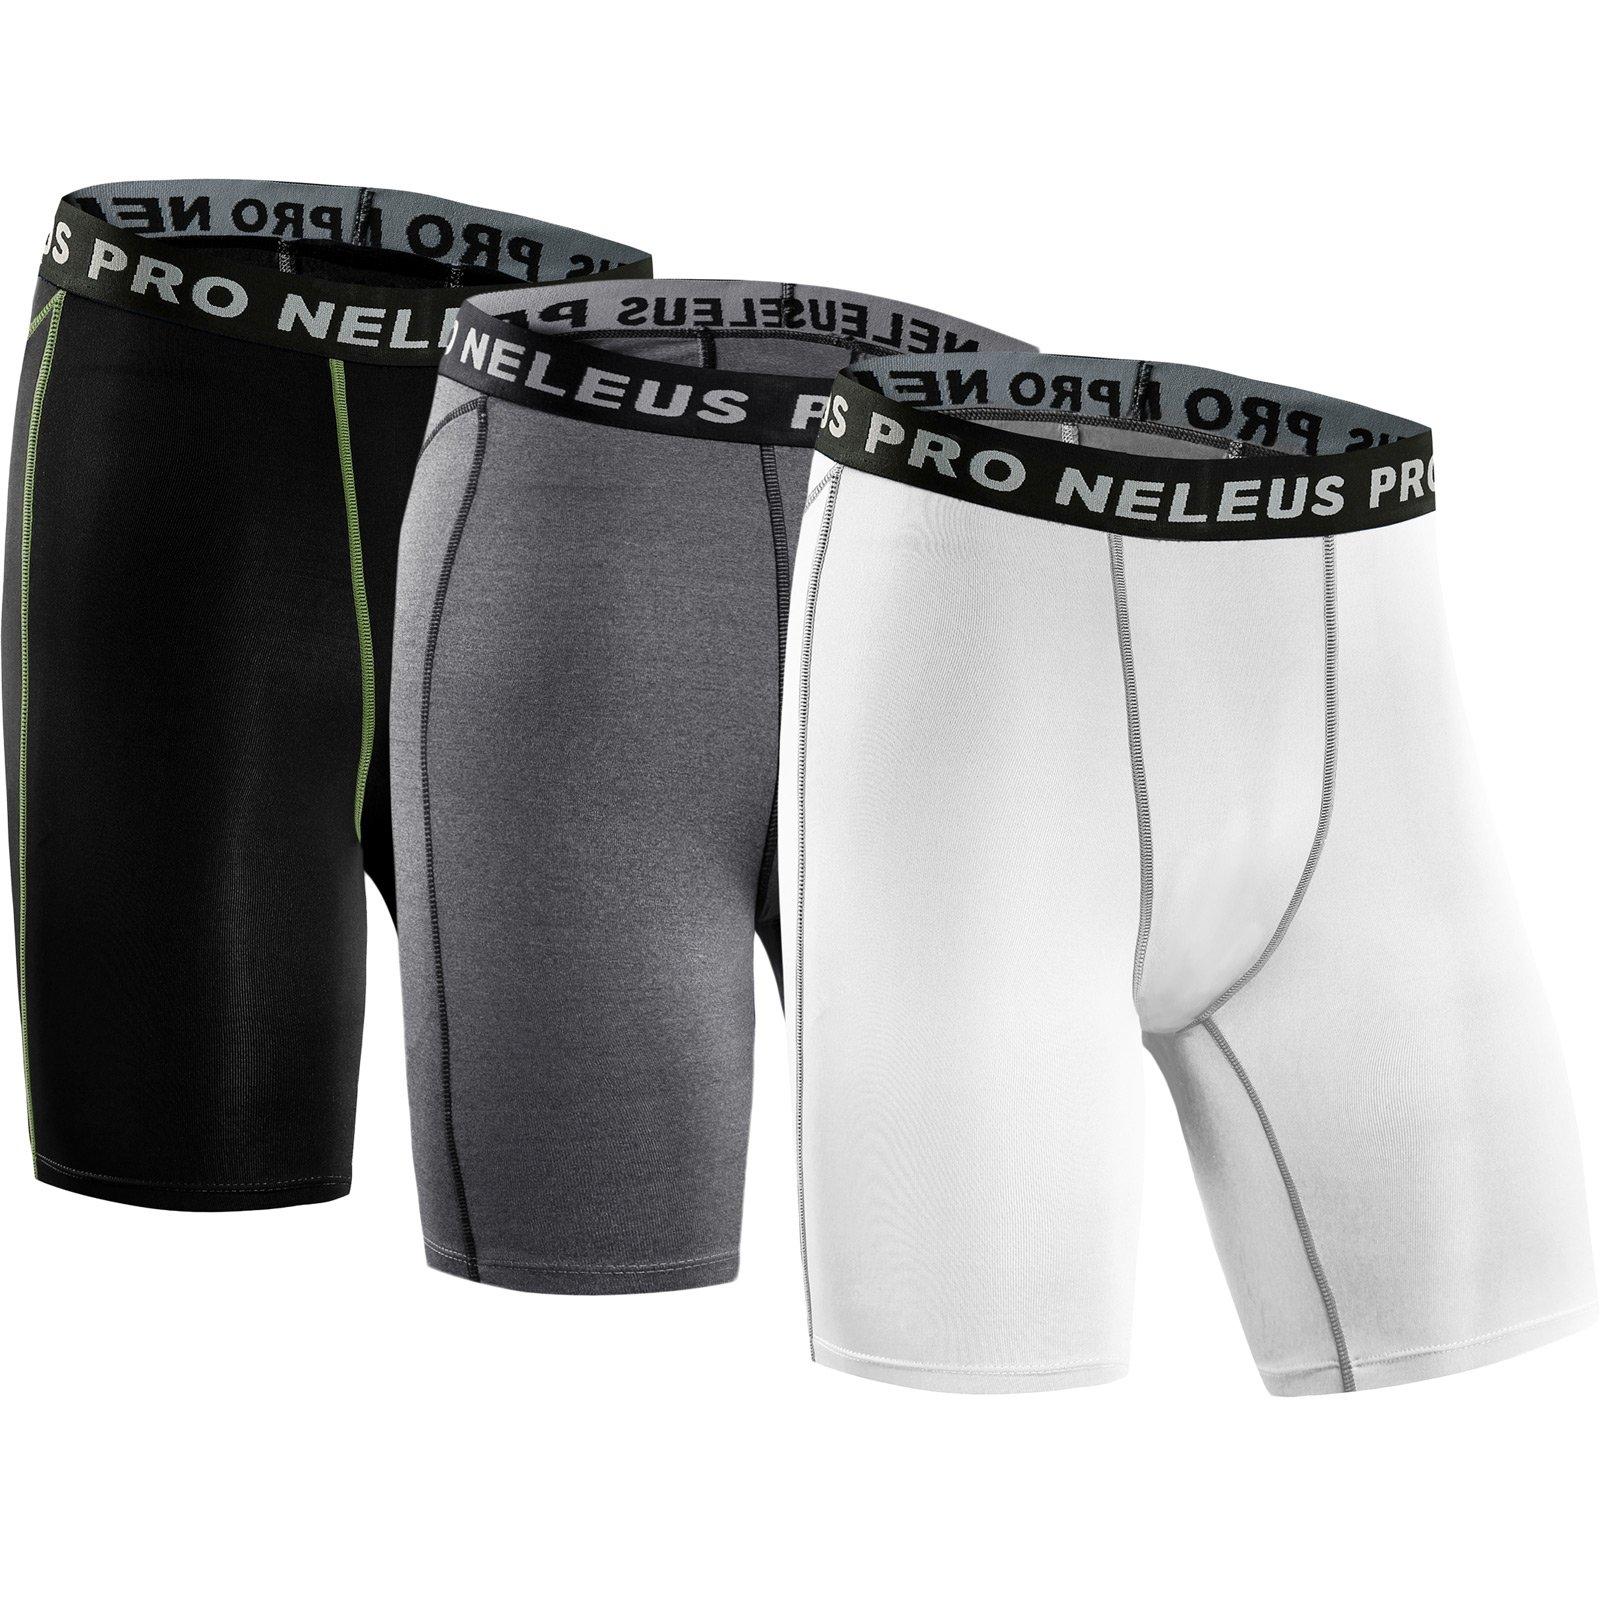 Neleus Men's 3 Pack Compression Short,047,Black,Grey,White,US L,EU XL by Neleus